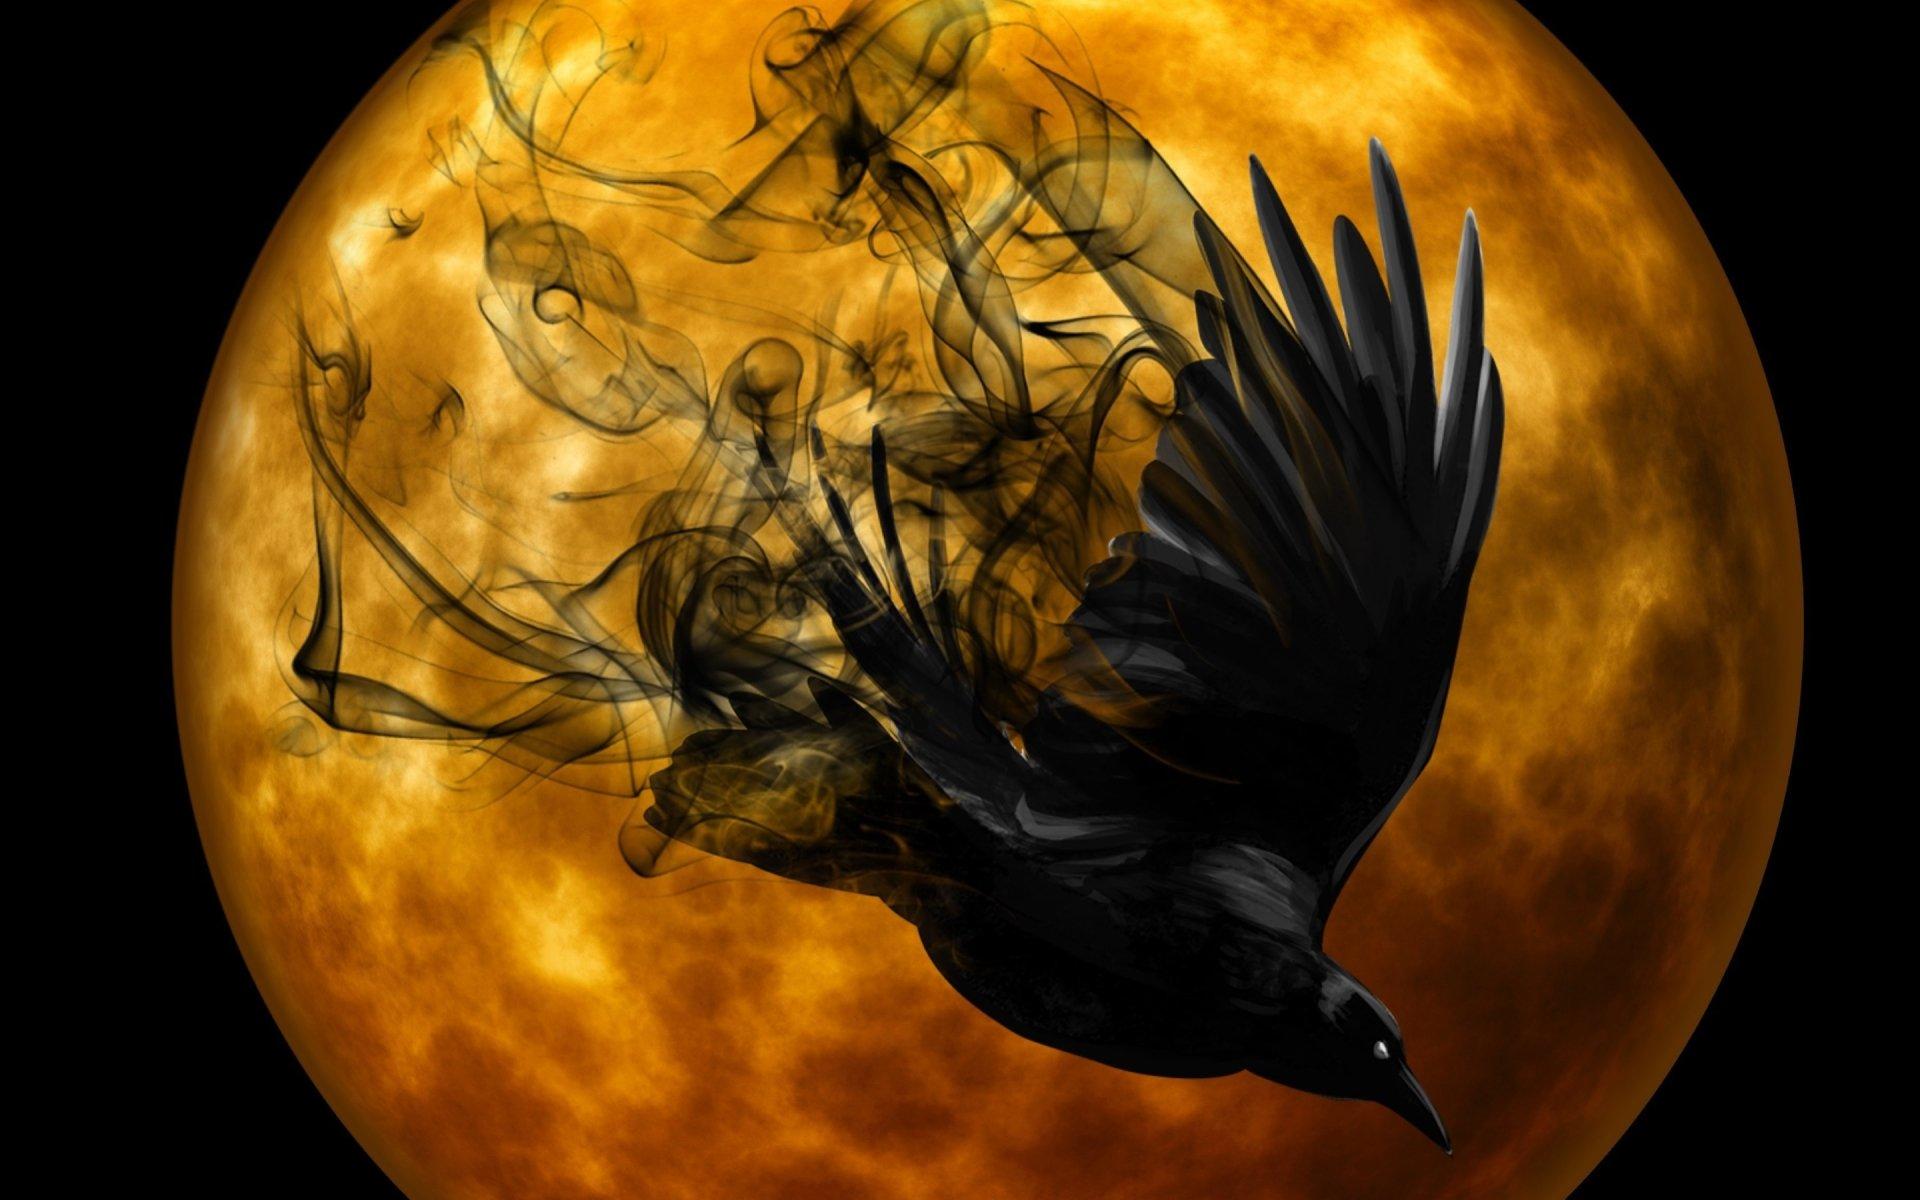 halloween orange and black wallpaper - photo #27